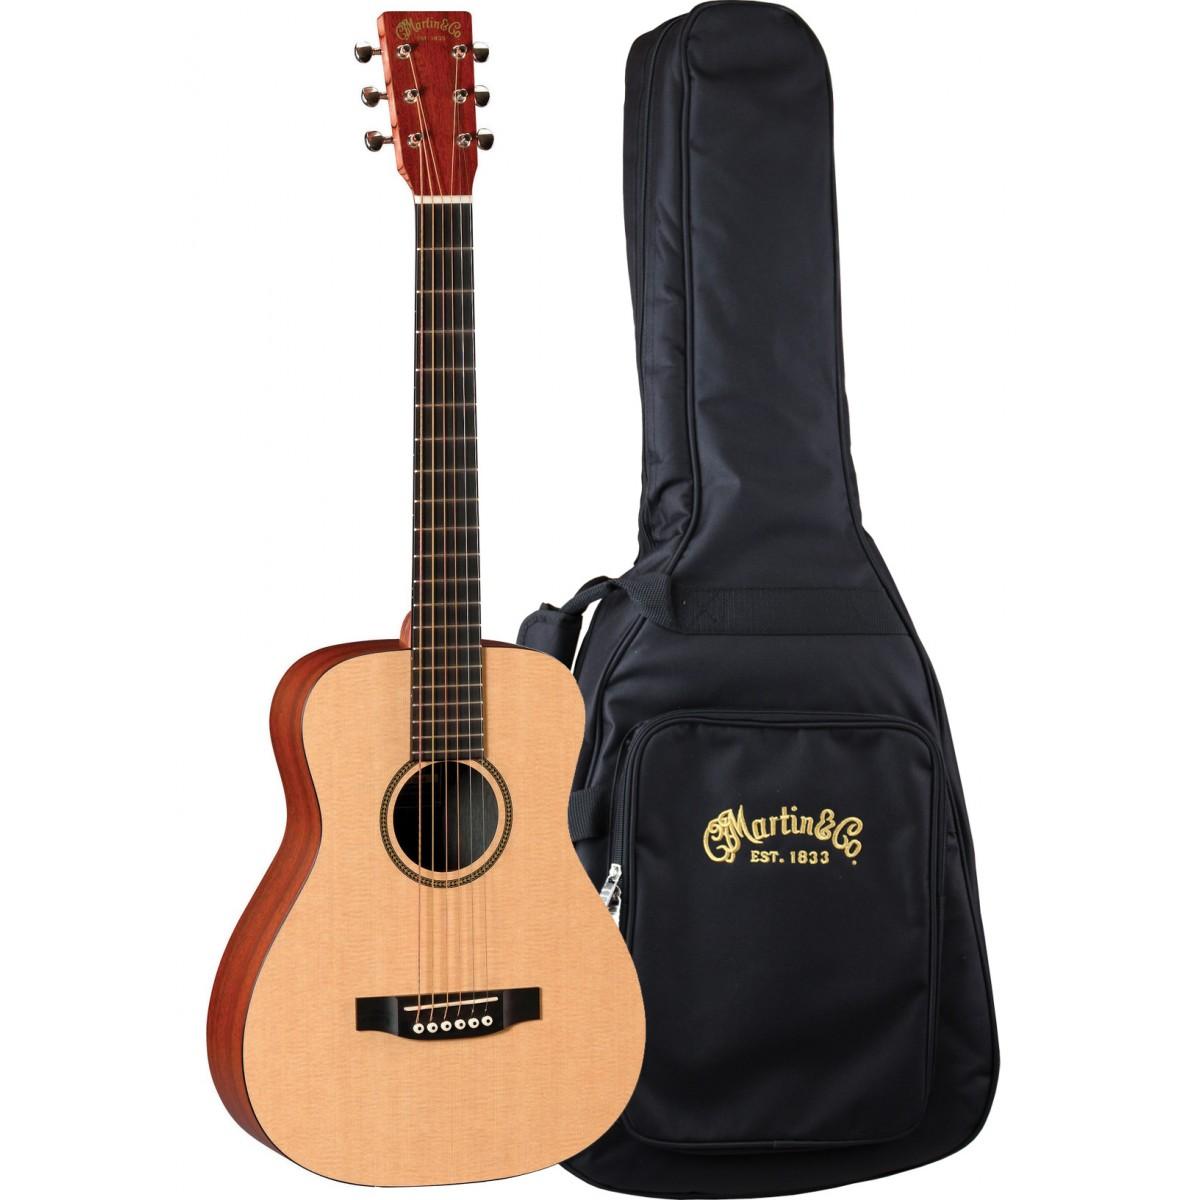 Martin Semi Acoustic Guitar Lx1e Little Martin With Padded Gig Bag